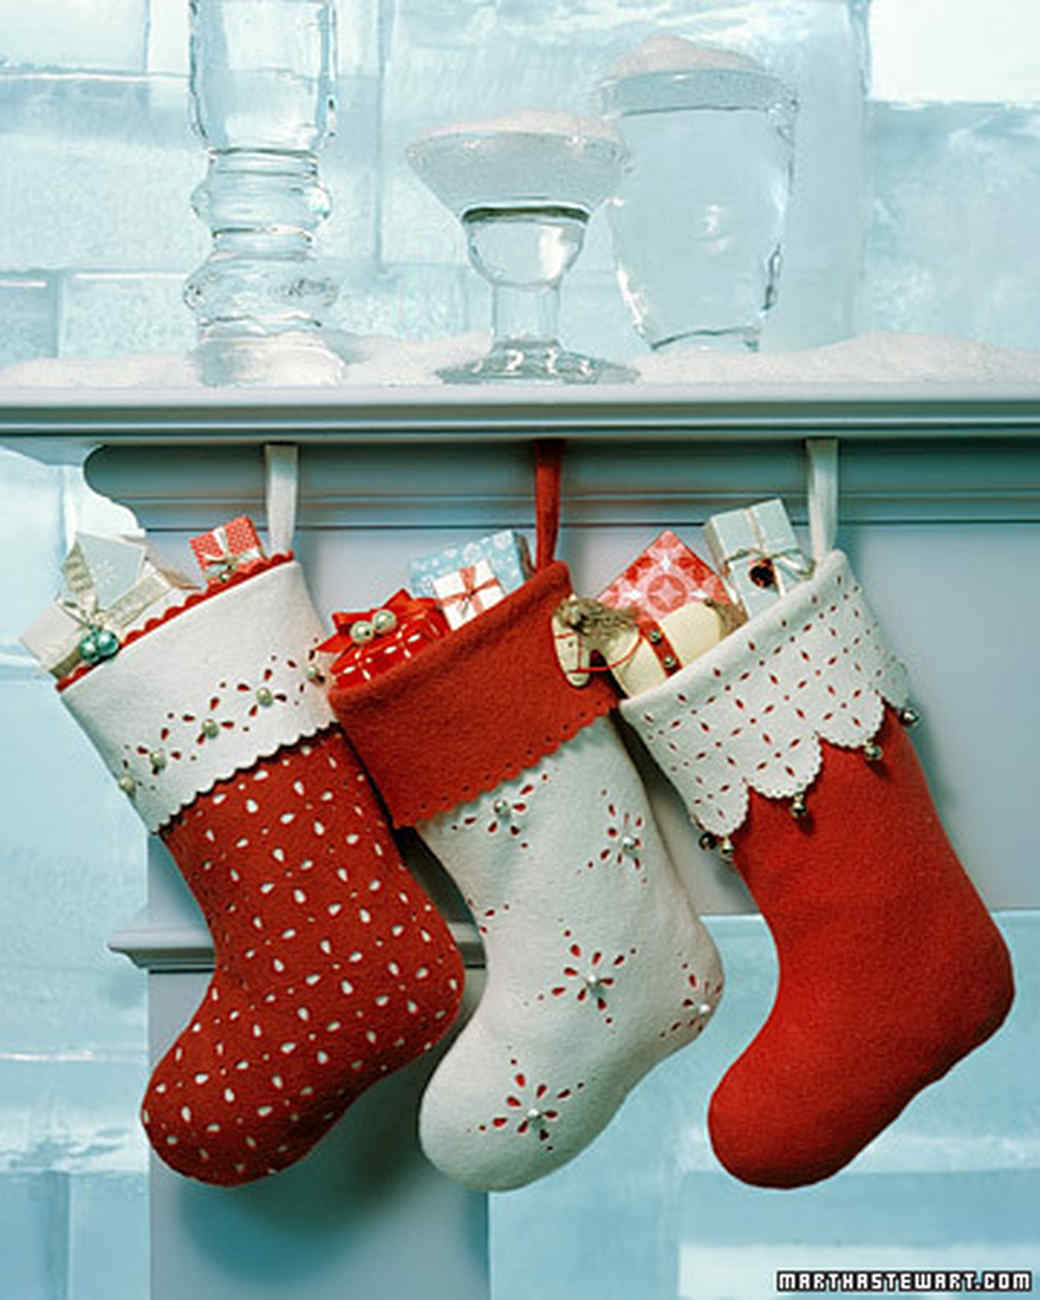 Sewing:Fabric Magic Cuff Christmas Stocking